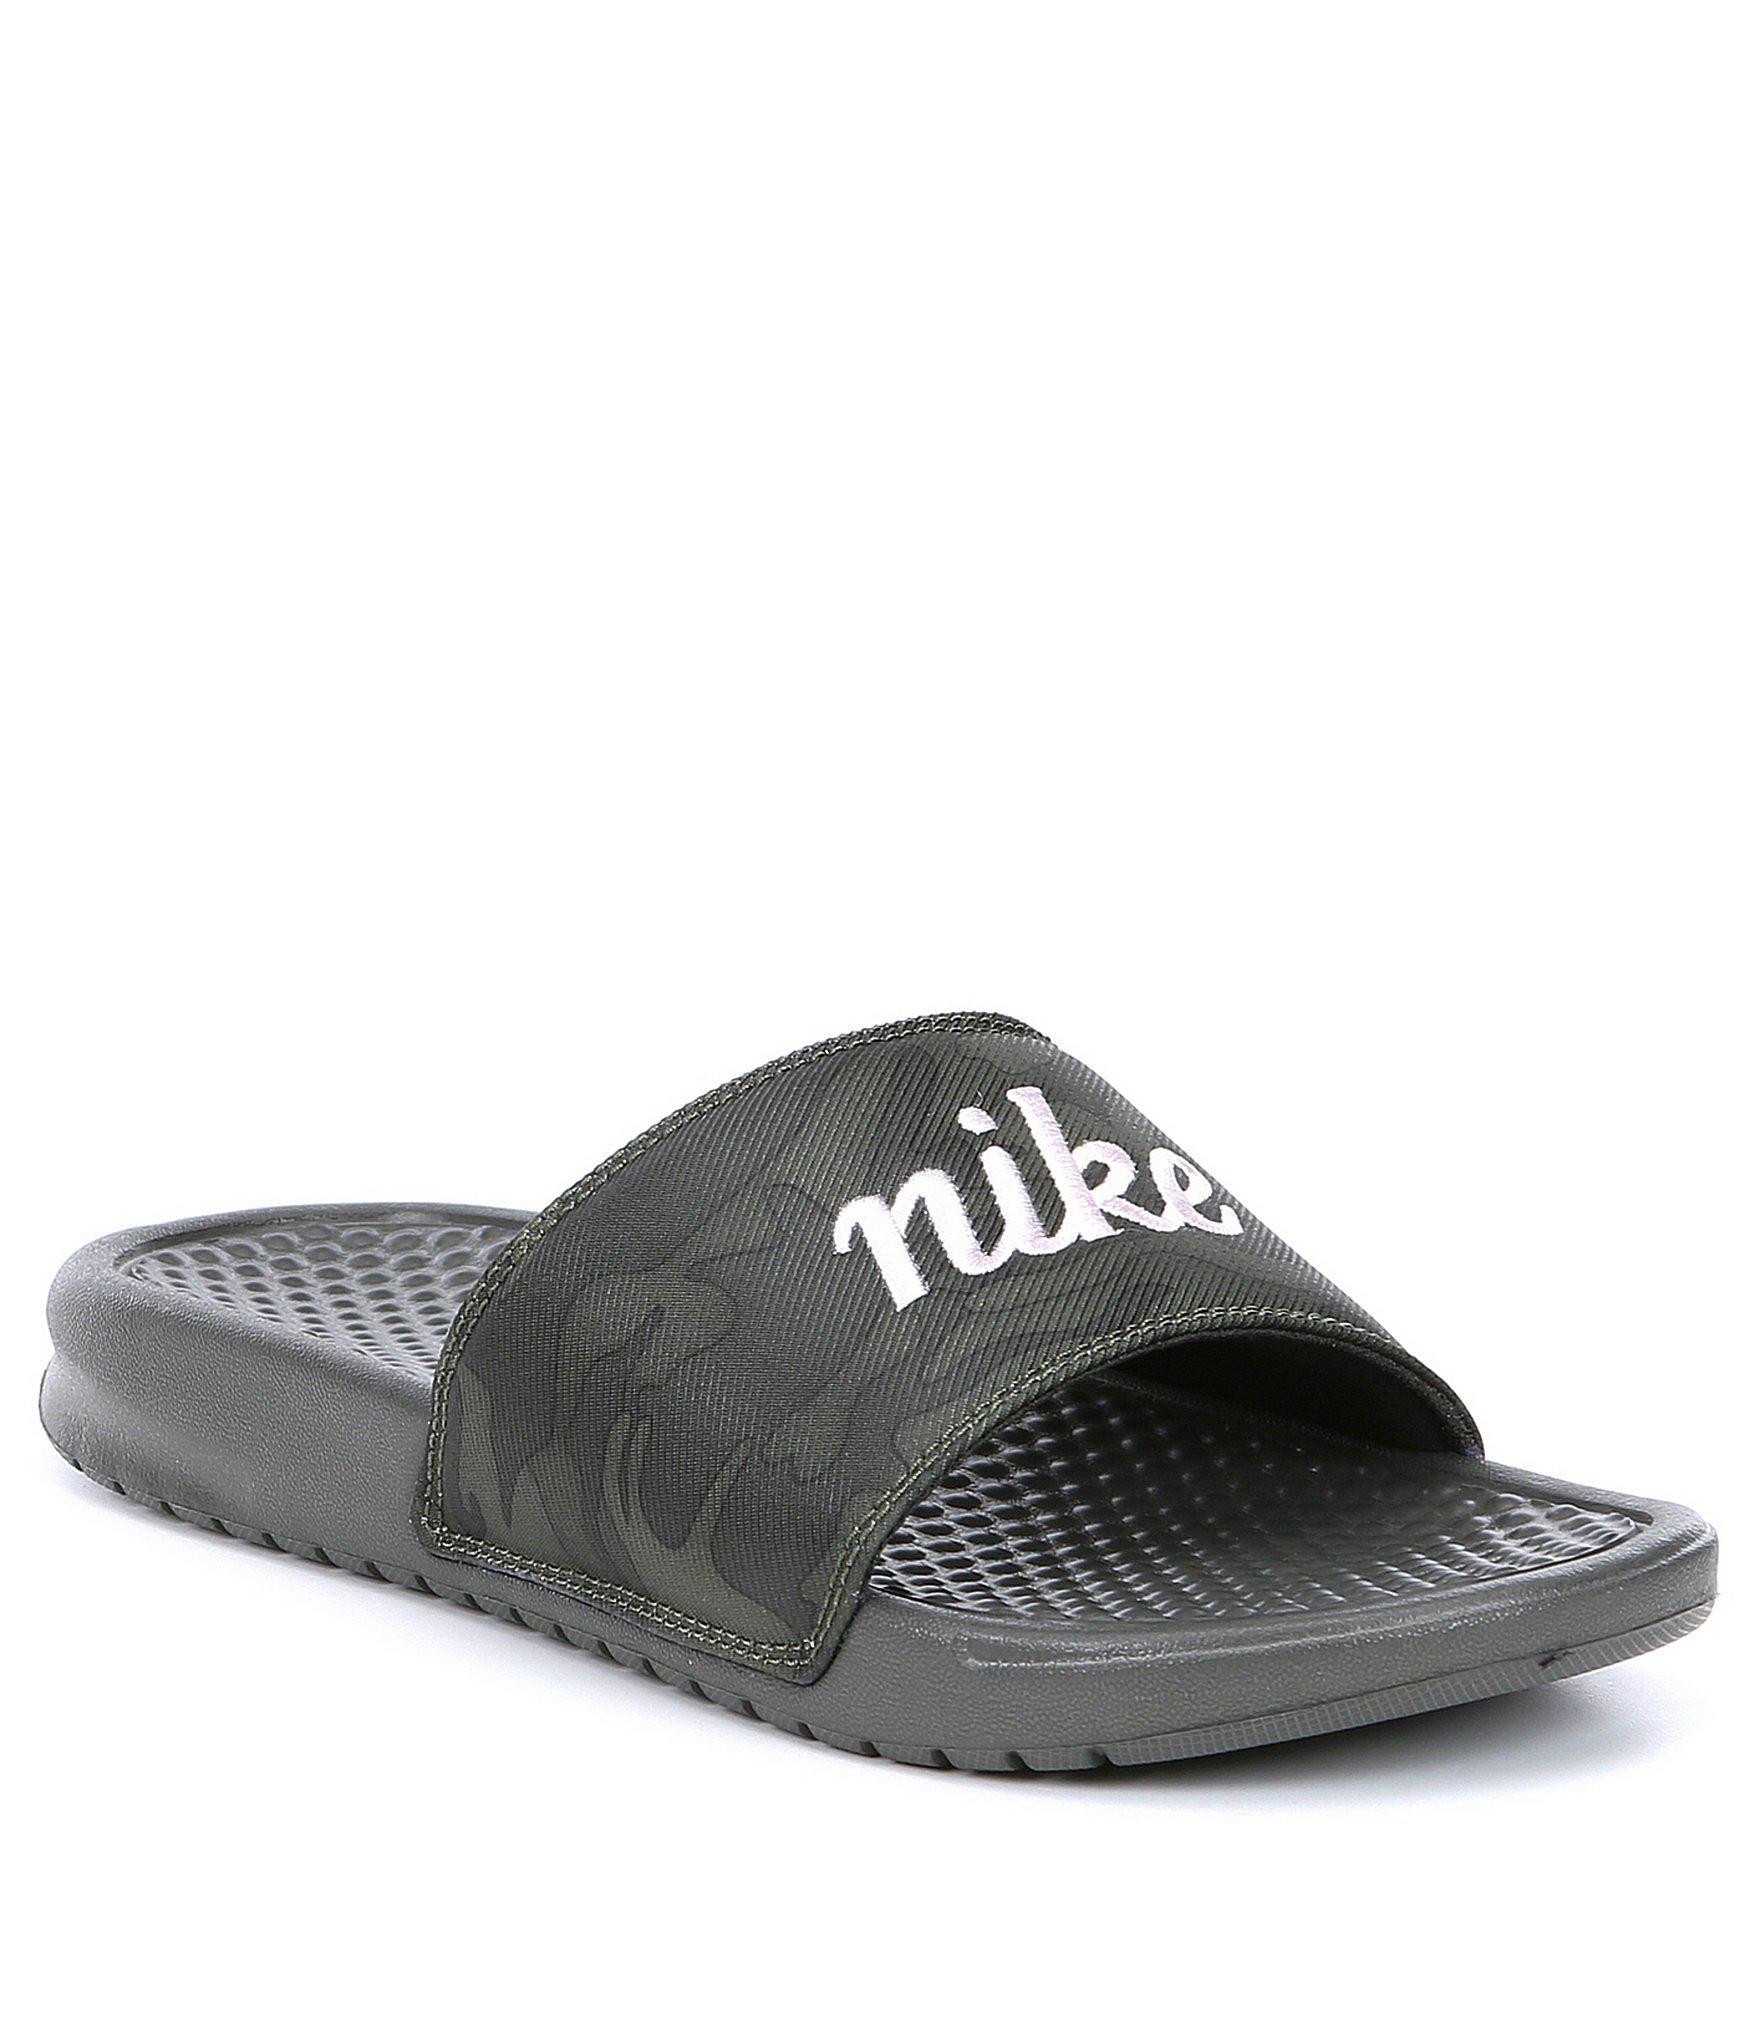 low priced 482bc 65527 Nike. Black Women s Benassi Jdi Textile Se Slide